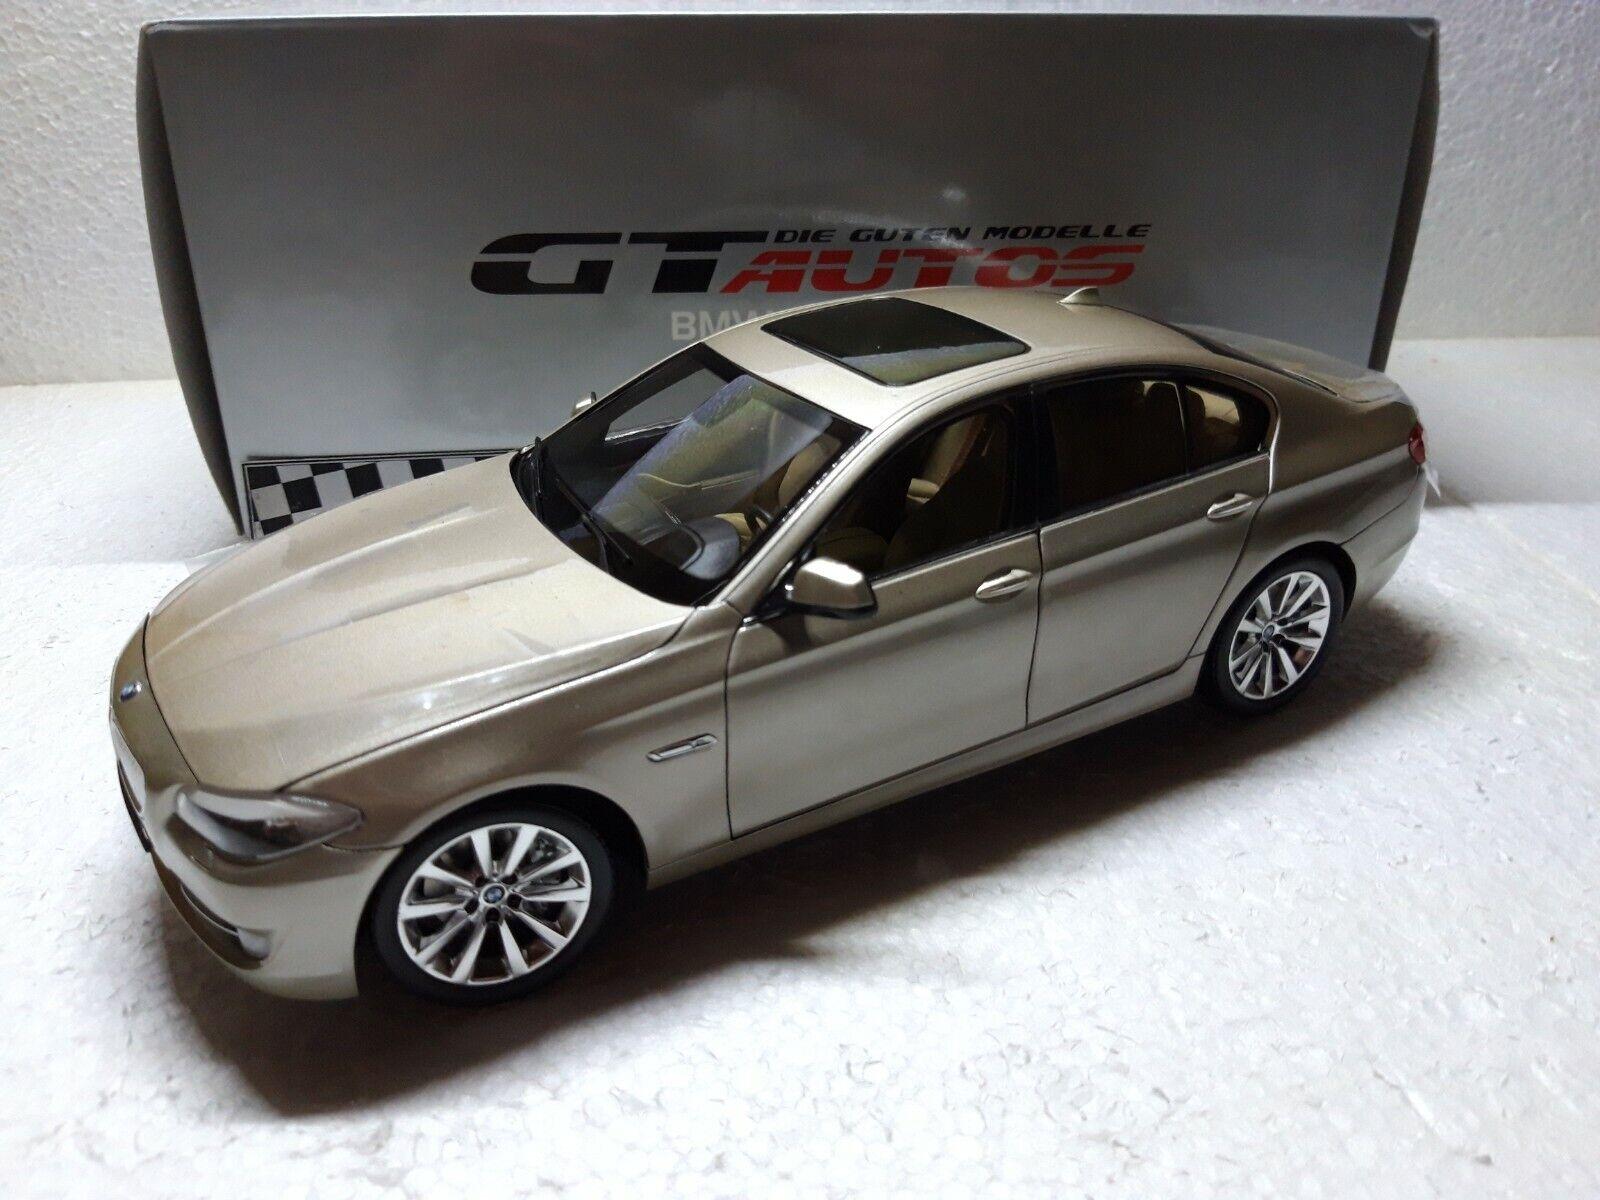 BMW 5er (f10)  NUOVO  Welly GTA  1 18